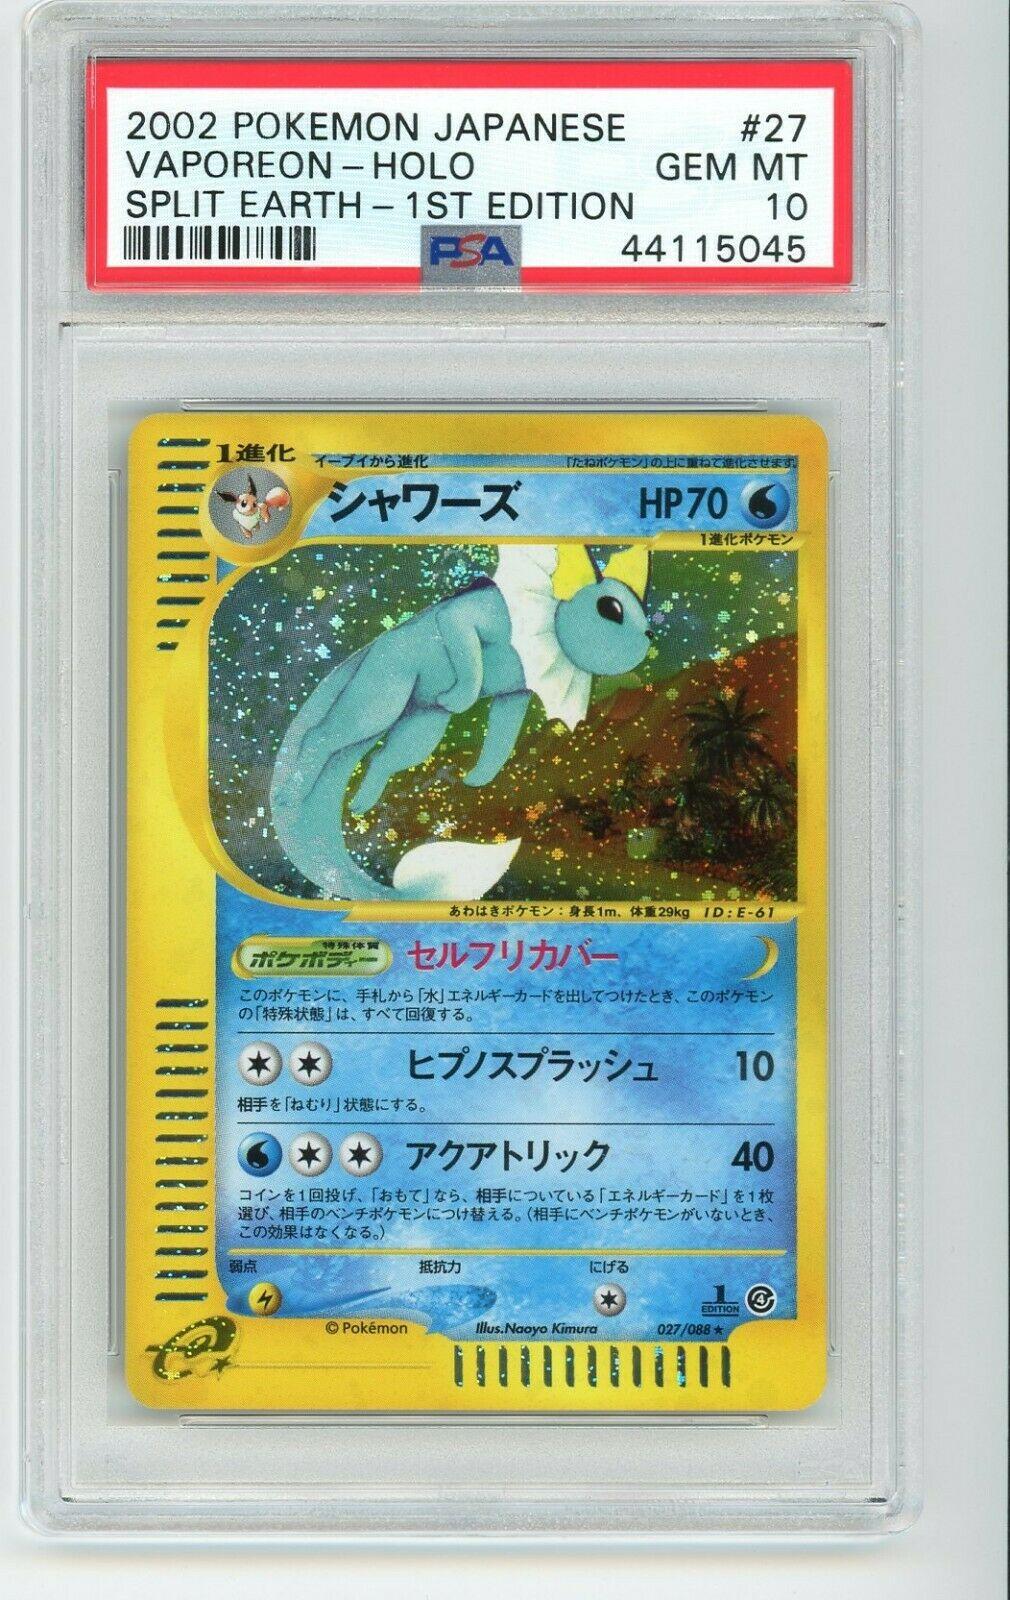 PSA 10 POKEMON JAPANESE VAPOREON 027088 CARD 2002 1ST ED ESERIES AQUAPOLIS